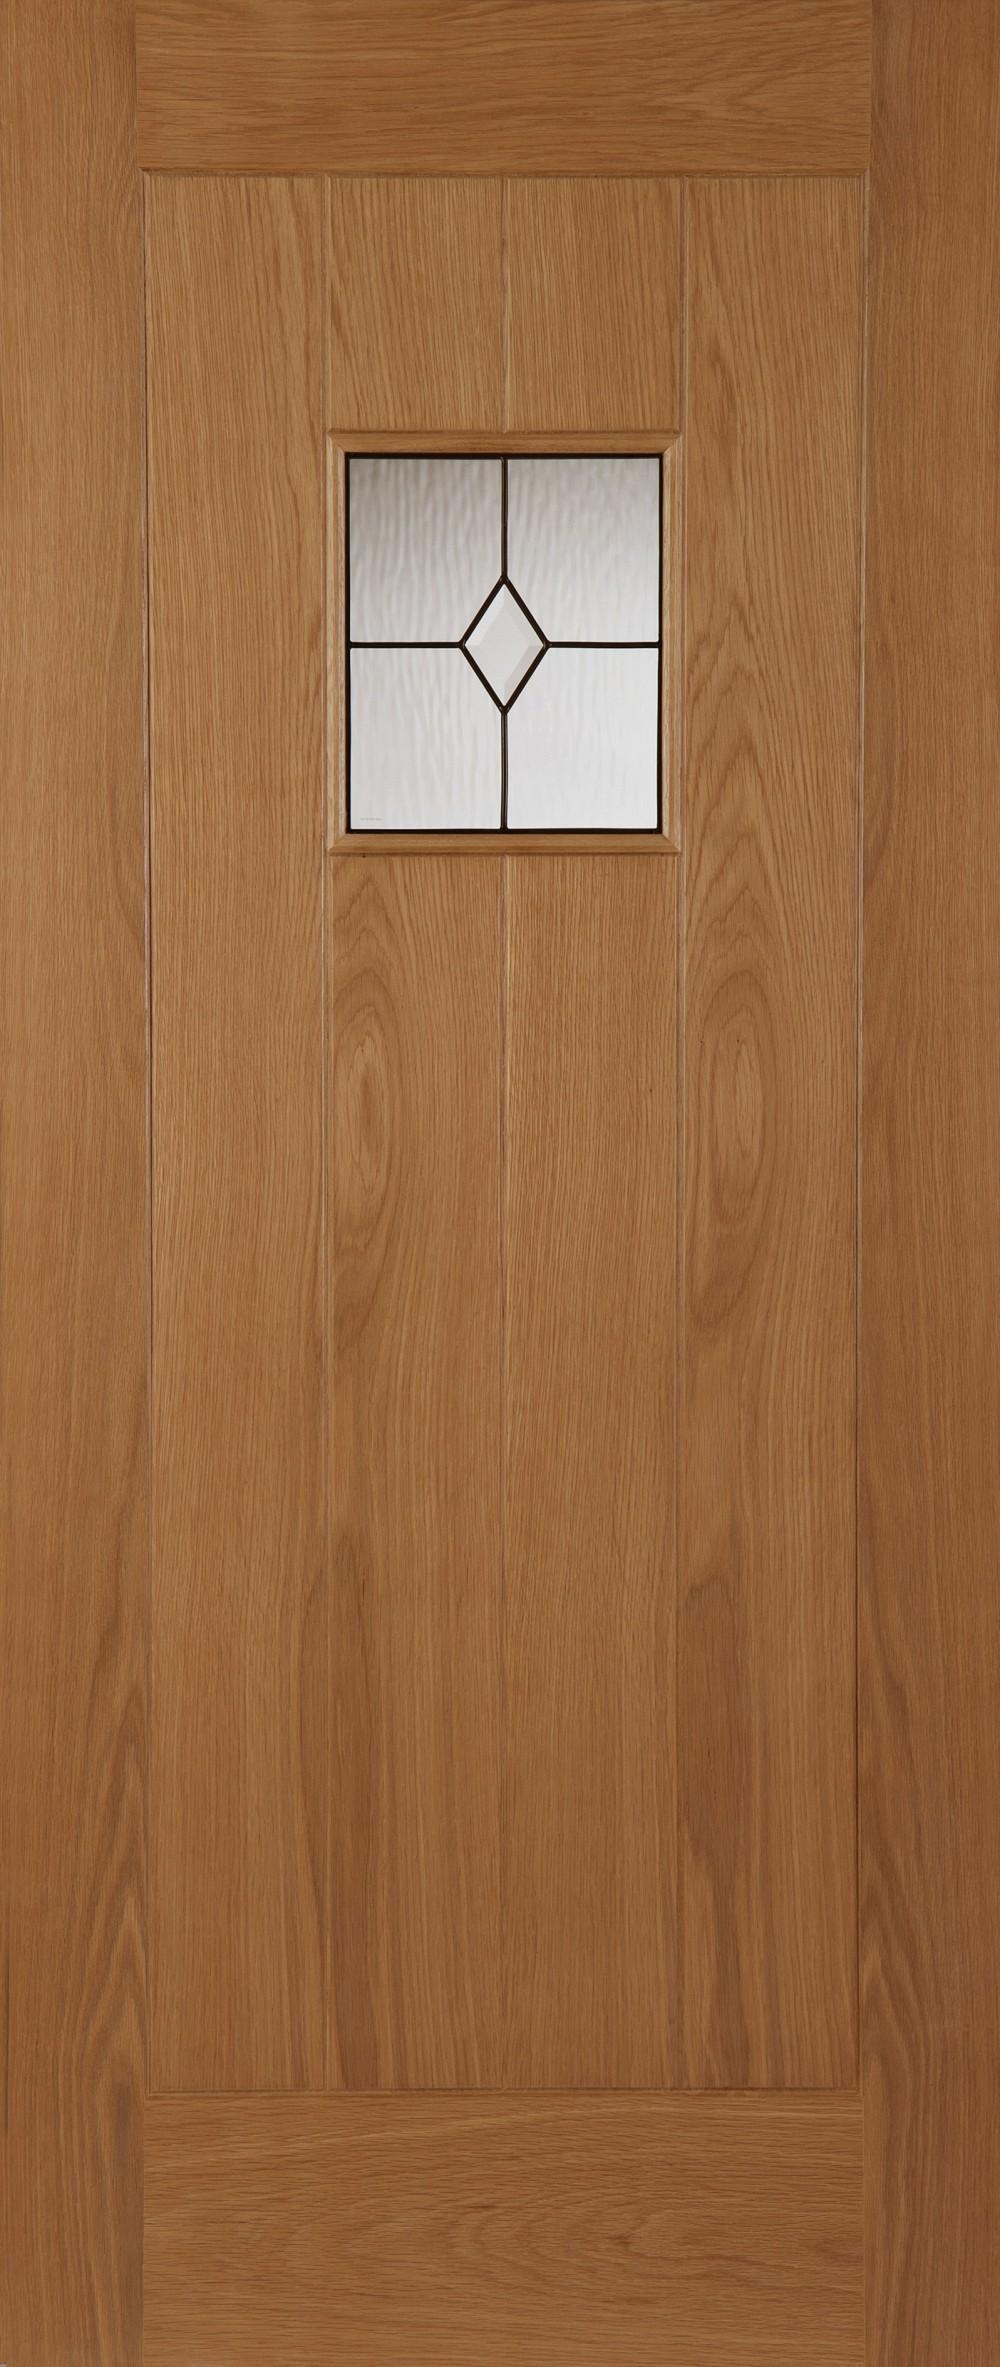 Thames oak triple glazed external door trading doors for Triple glazed doors